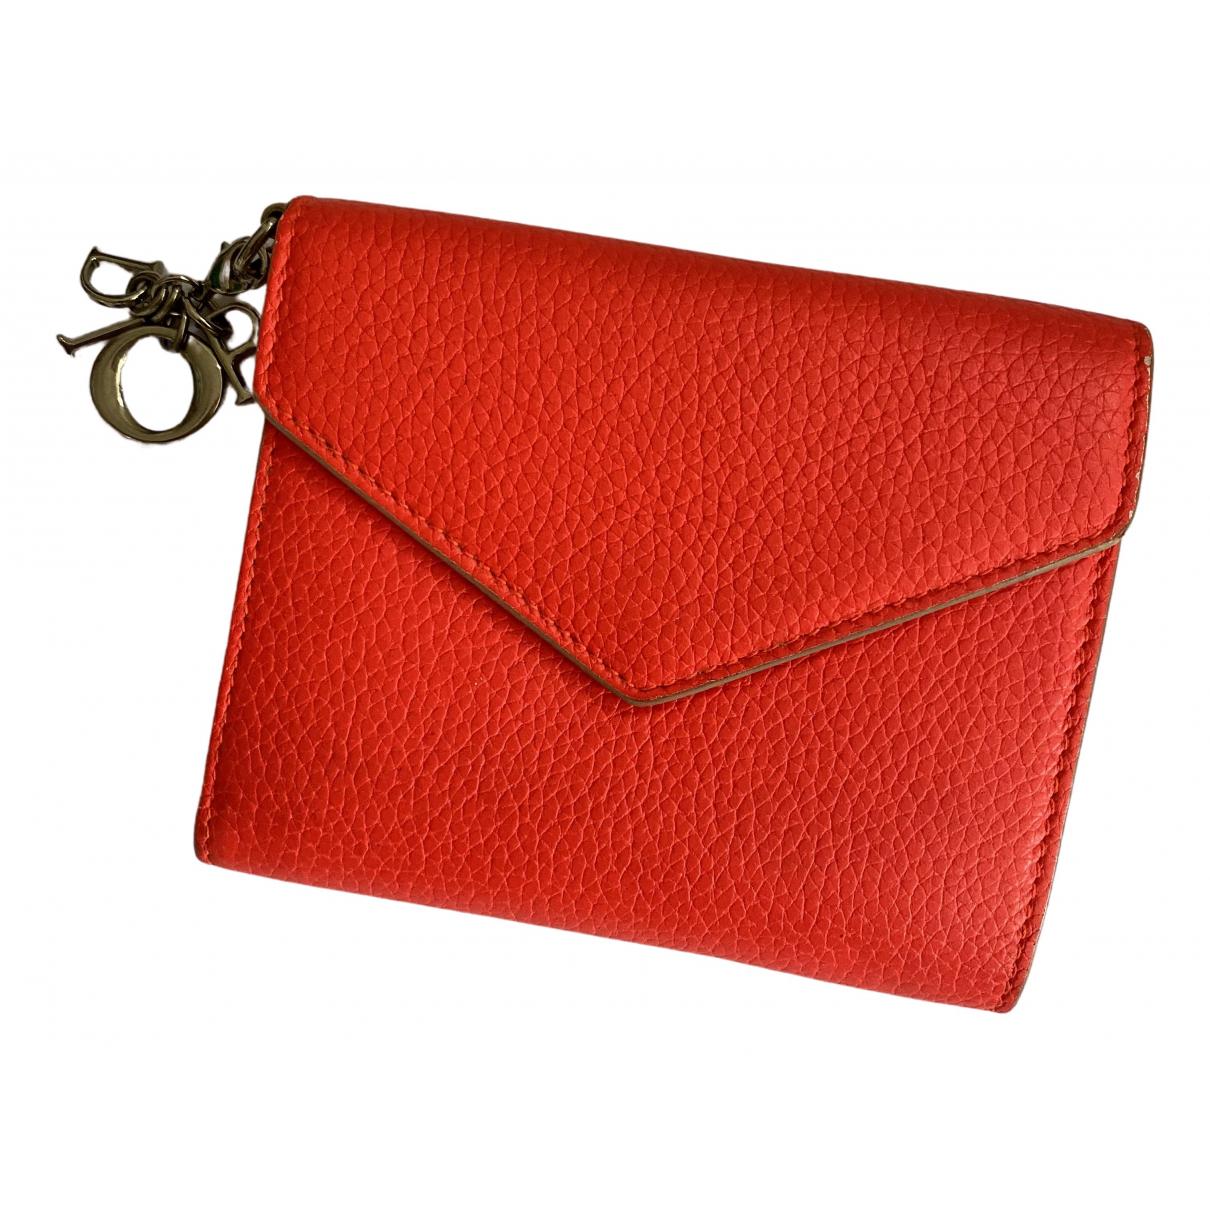 Dior \N Orange Leather wallet for Women \N